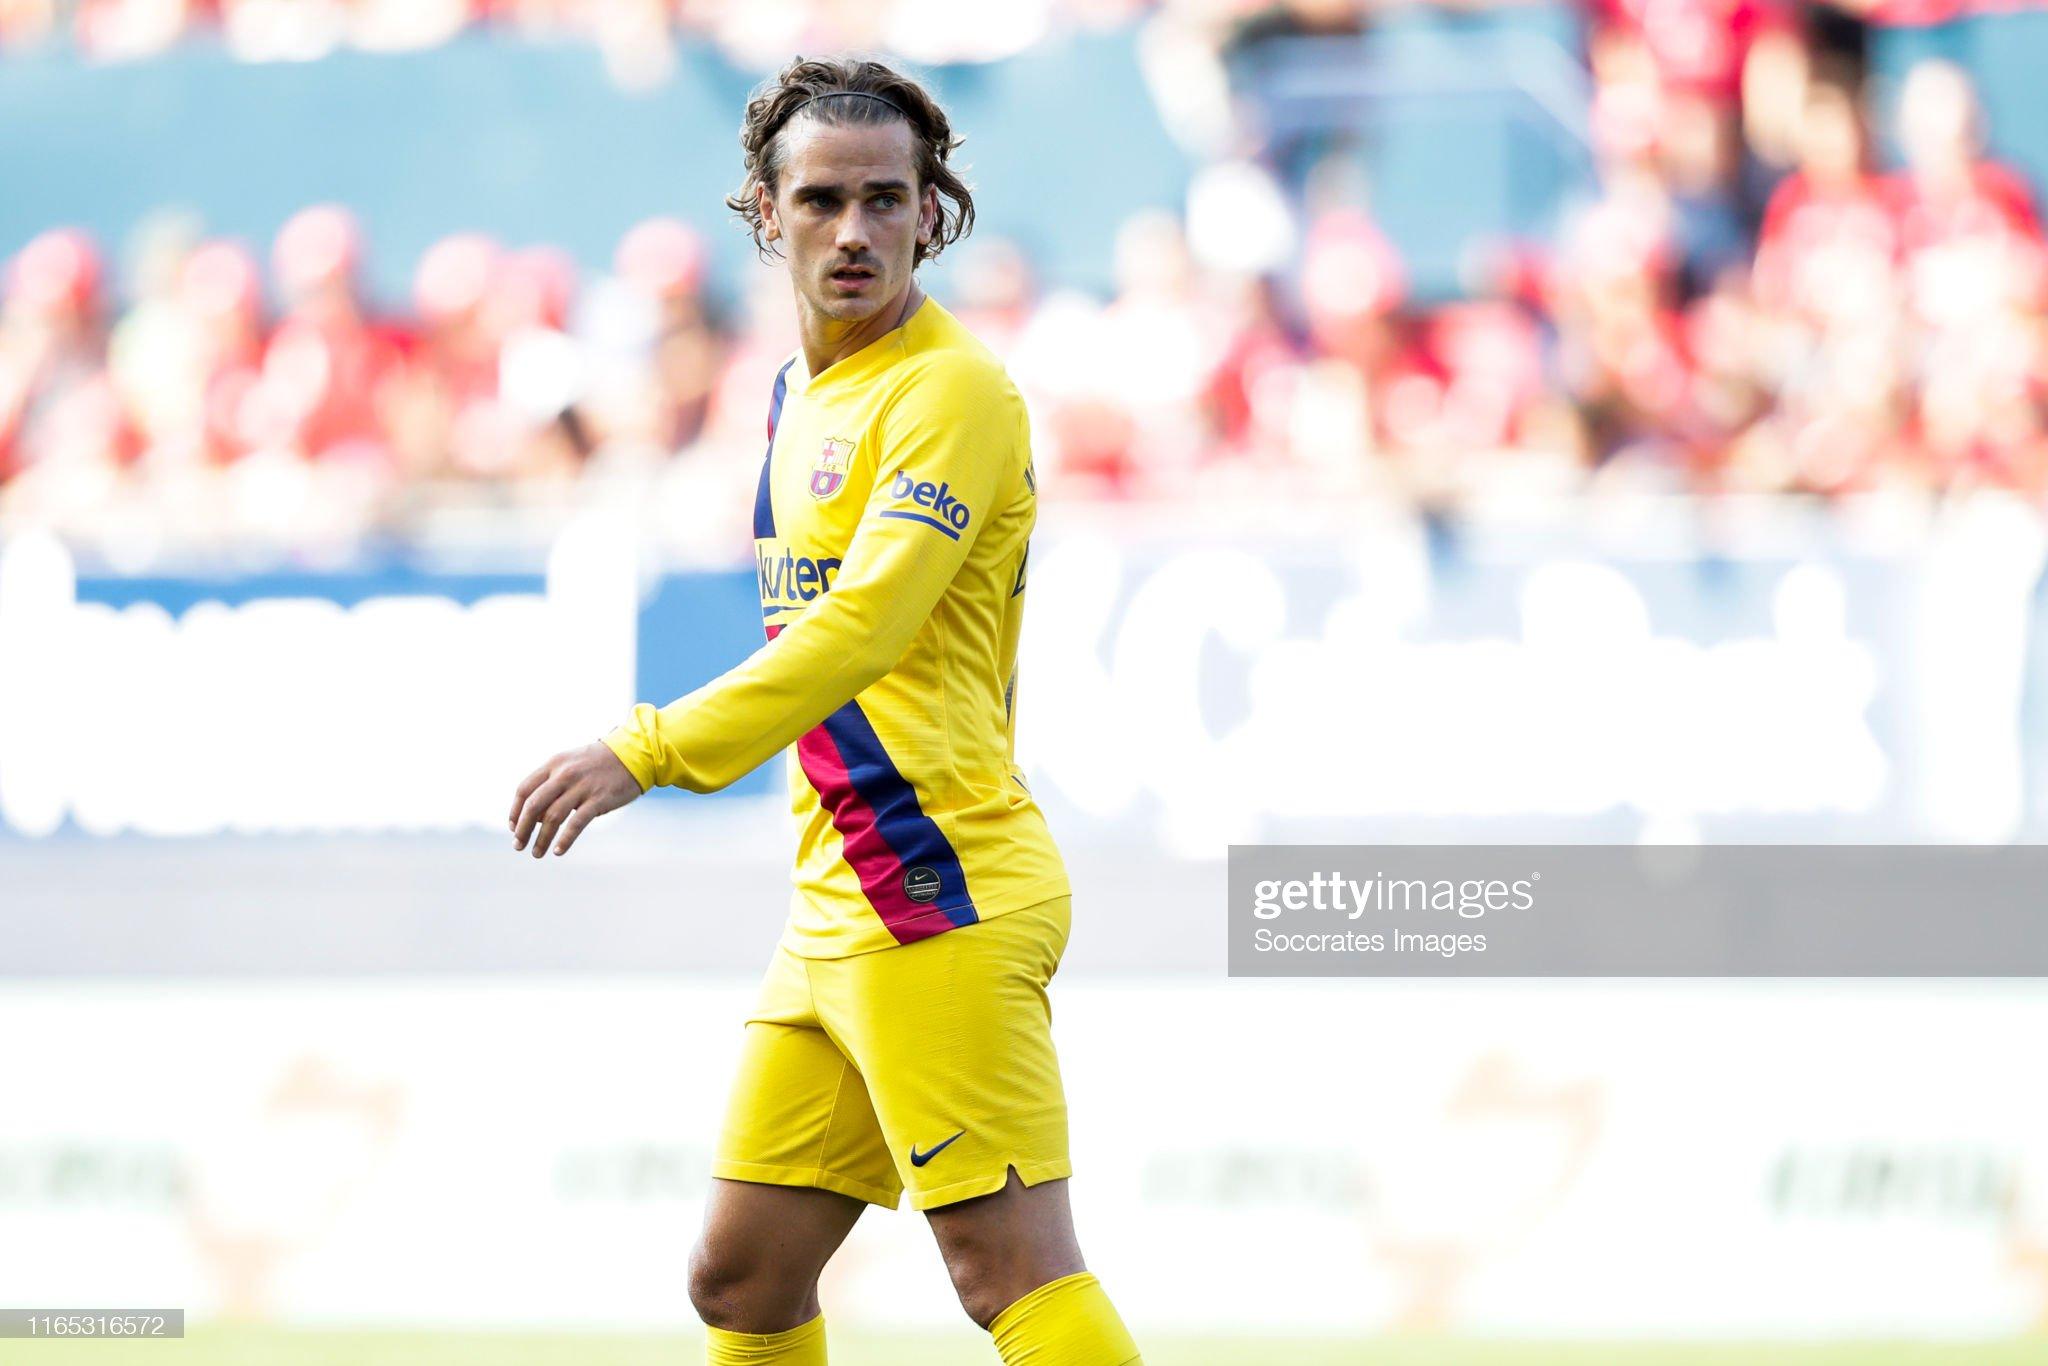 صور مباراة : أوساسونا - برشلونة 2-2 ( 31-08-2019 )  Antoine-griezmann-of-fc-barcelona-during-the-la-liga-santander-match-picture-id1165316572?s=2048x2048